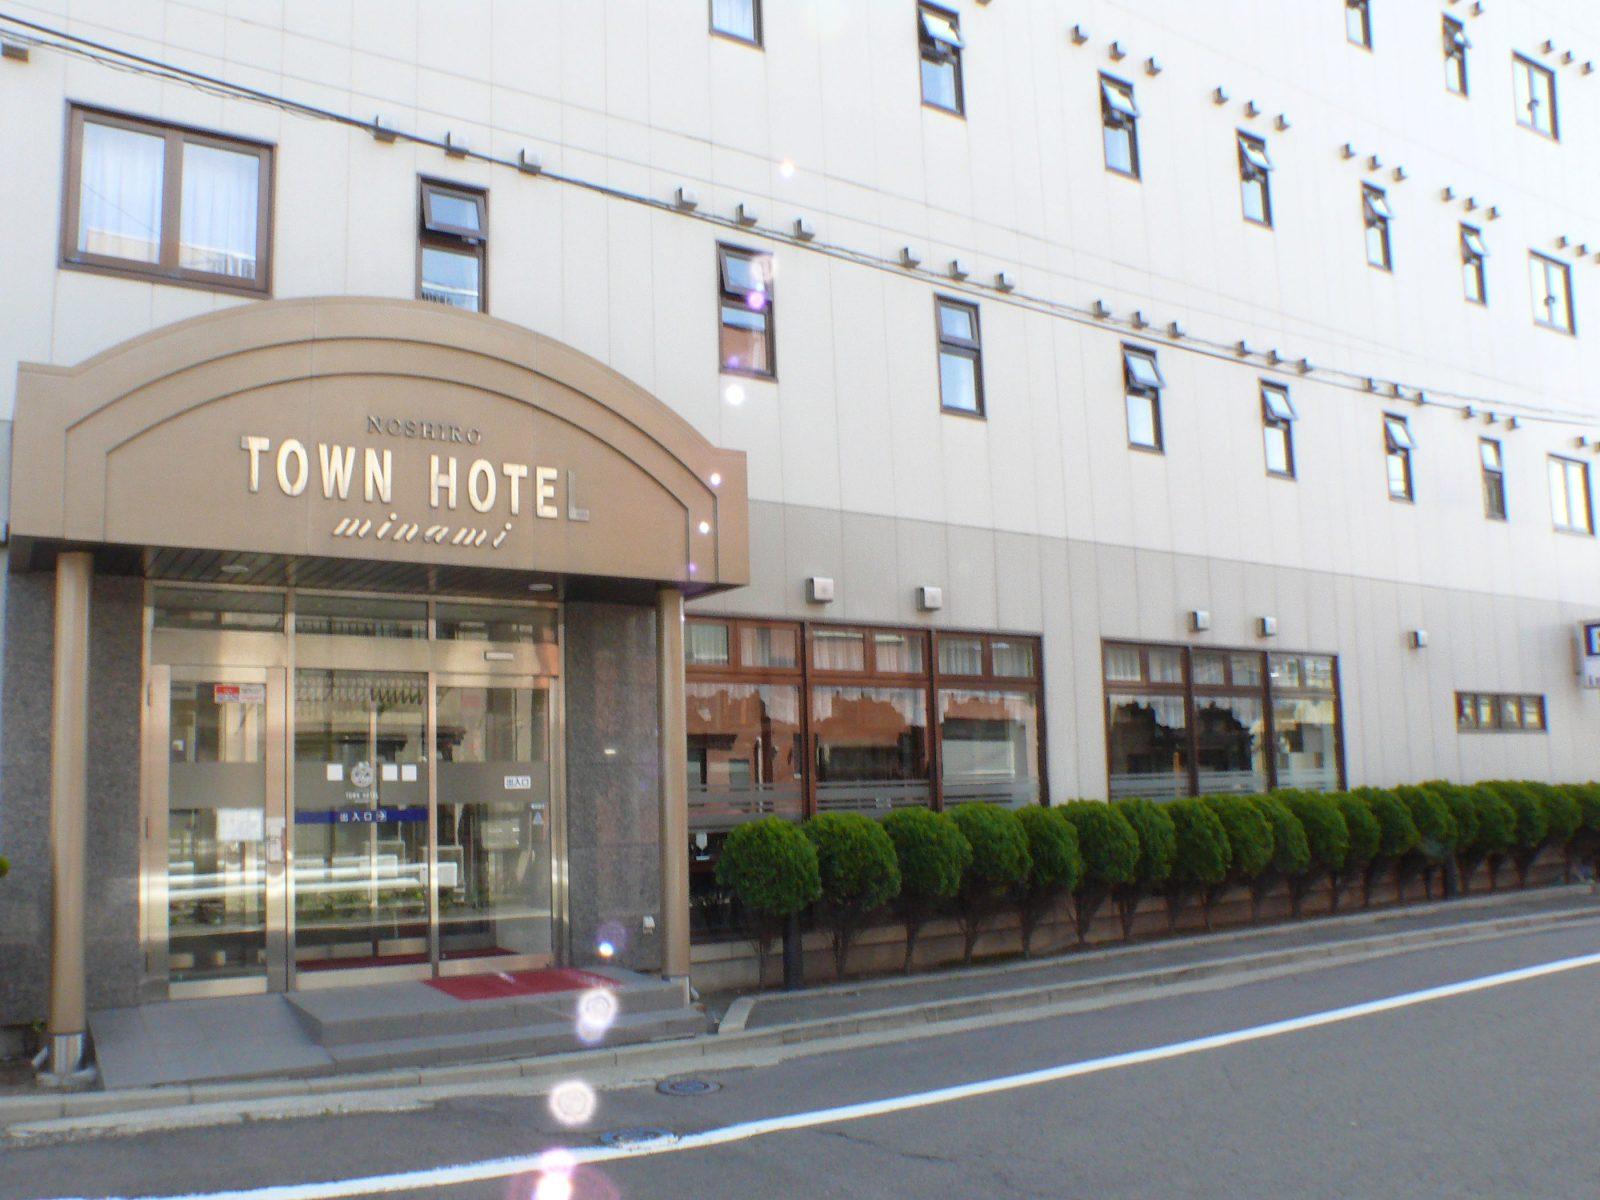 Noshiro Town Hotel Minami exterior.